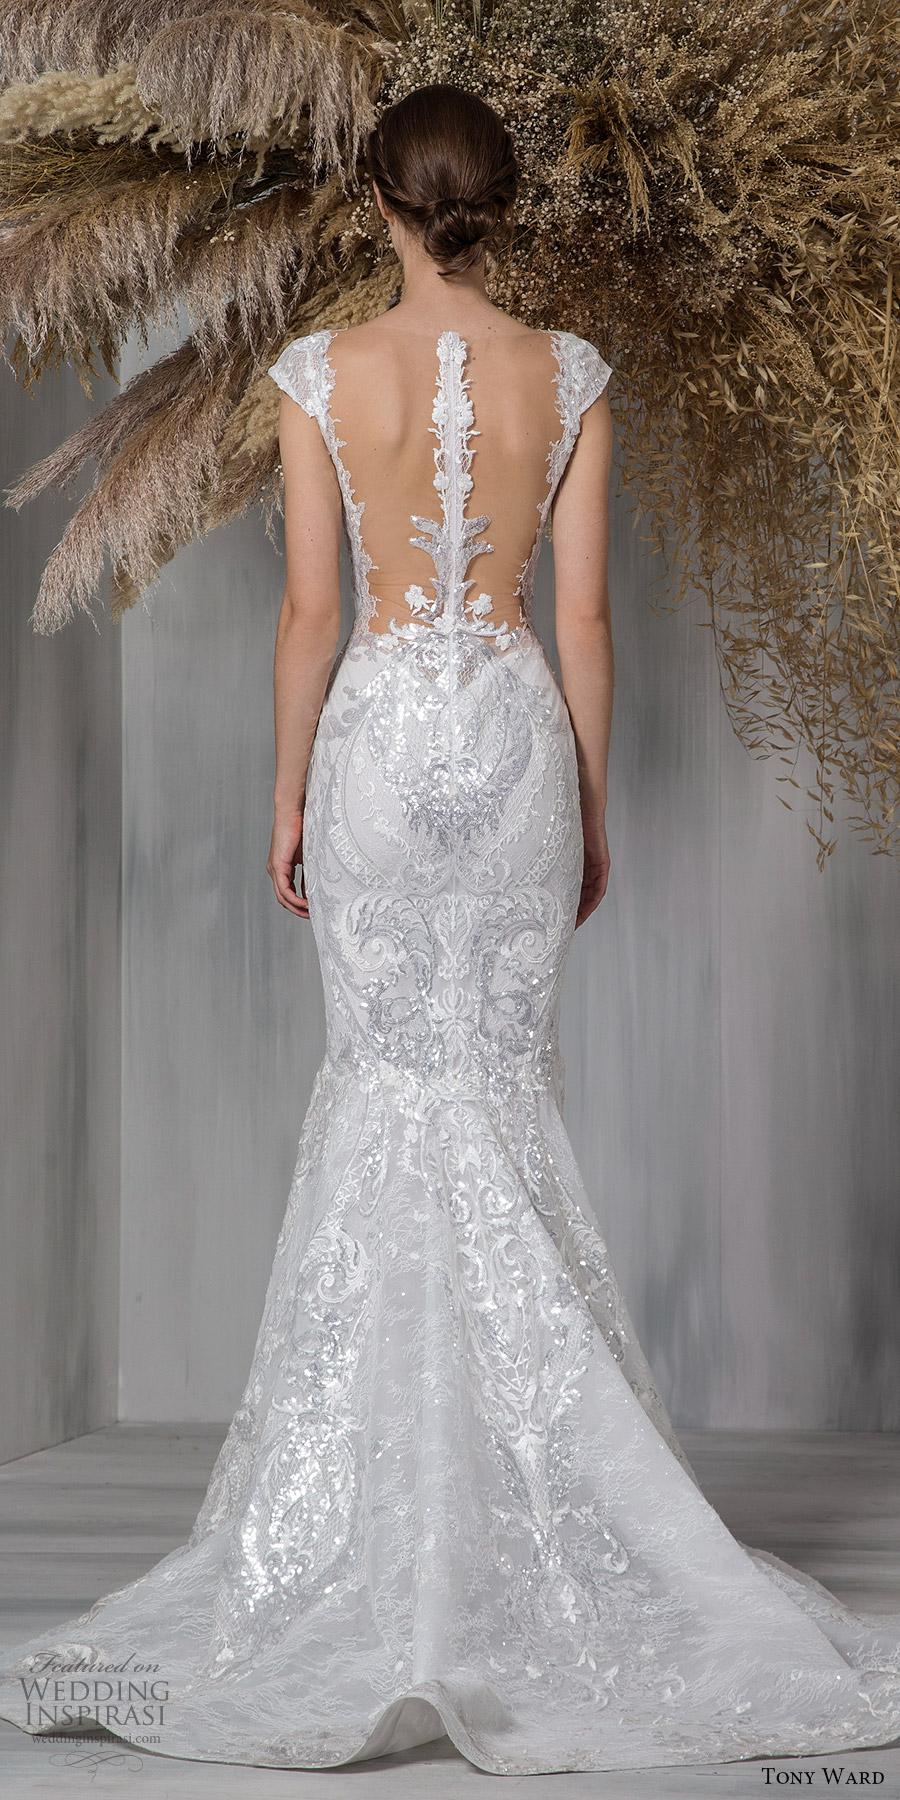 tony ward 2021 bridal cap sleeves sweetheart neckline fully embellished lace fit flare mermaid wedding dress chapel train (24) bv